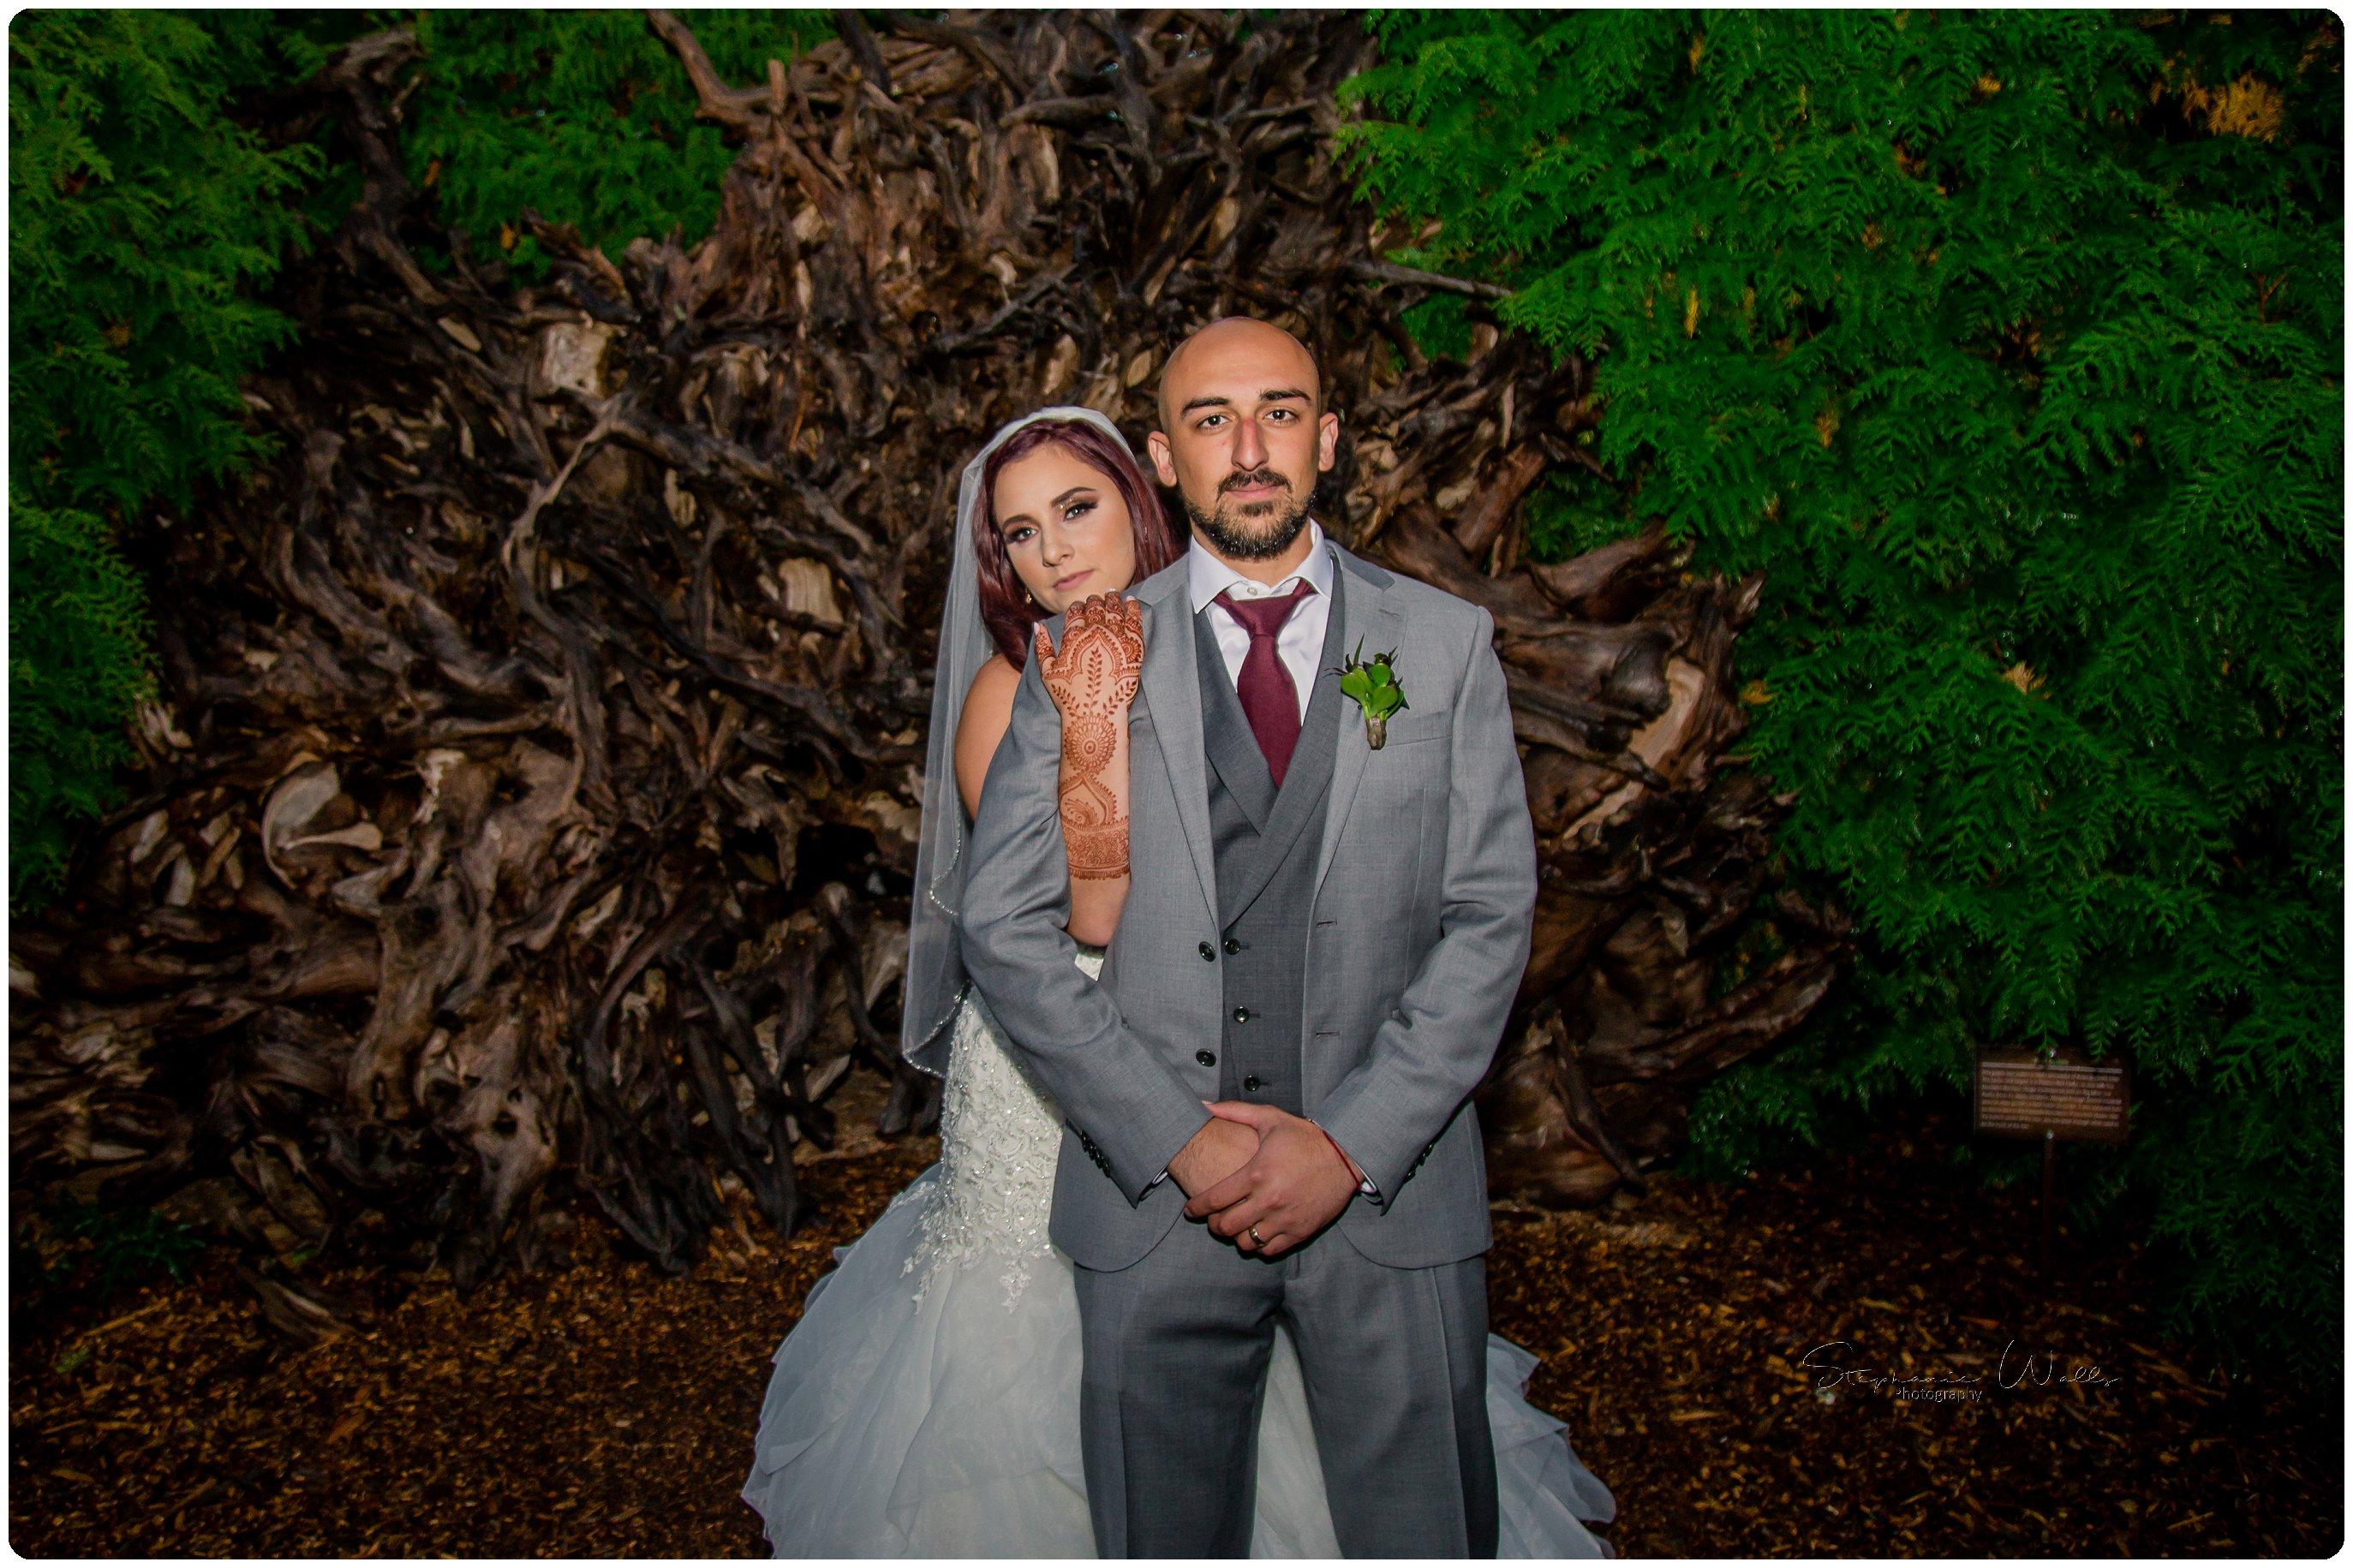 Wedding Party 109 Megan & Mo's Day 2   Willow Lodge Wedding   Woodinville, Wa Wedding Photographer